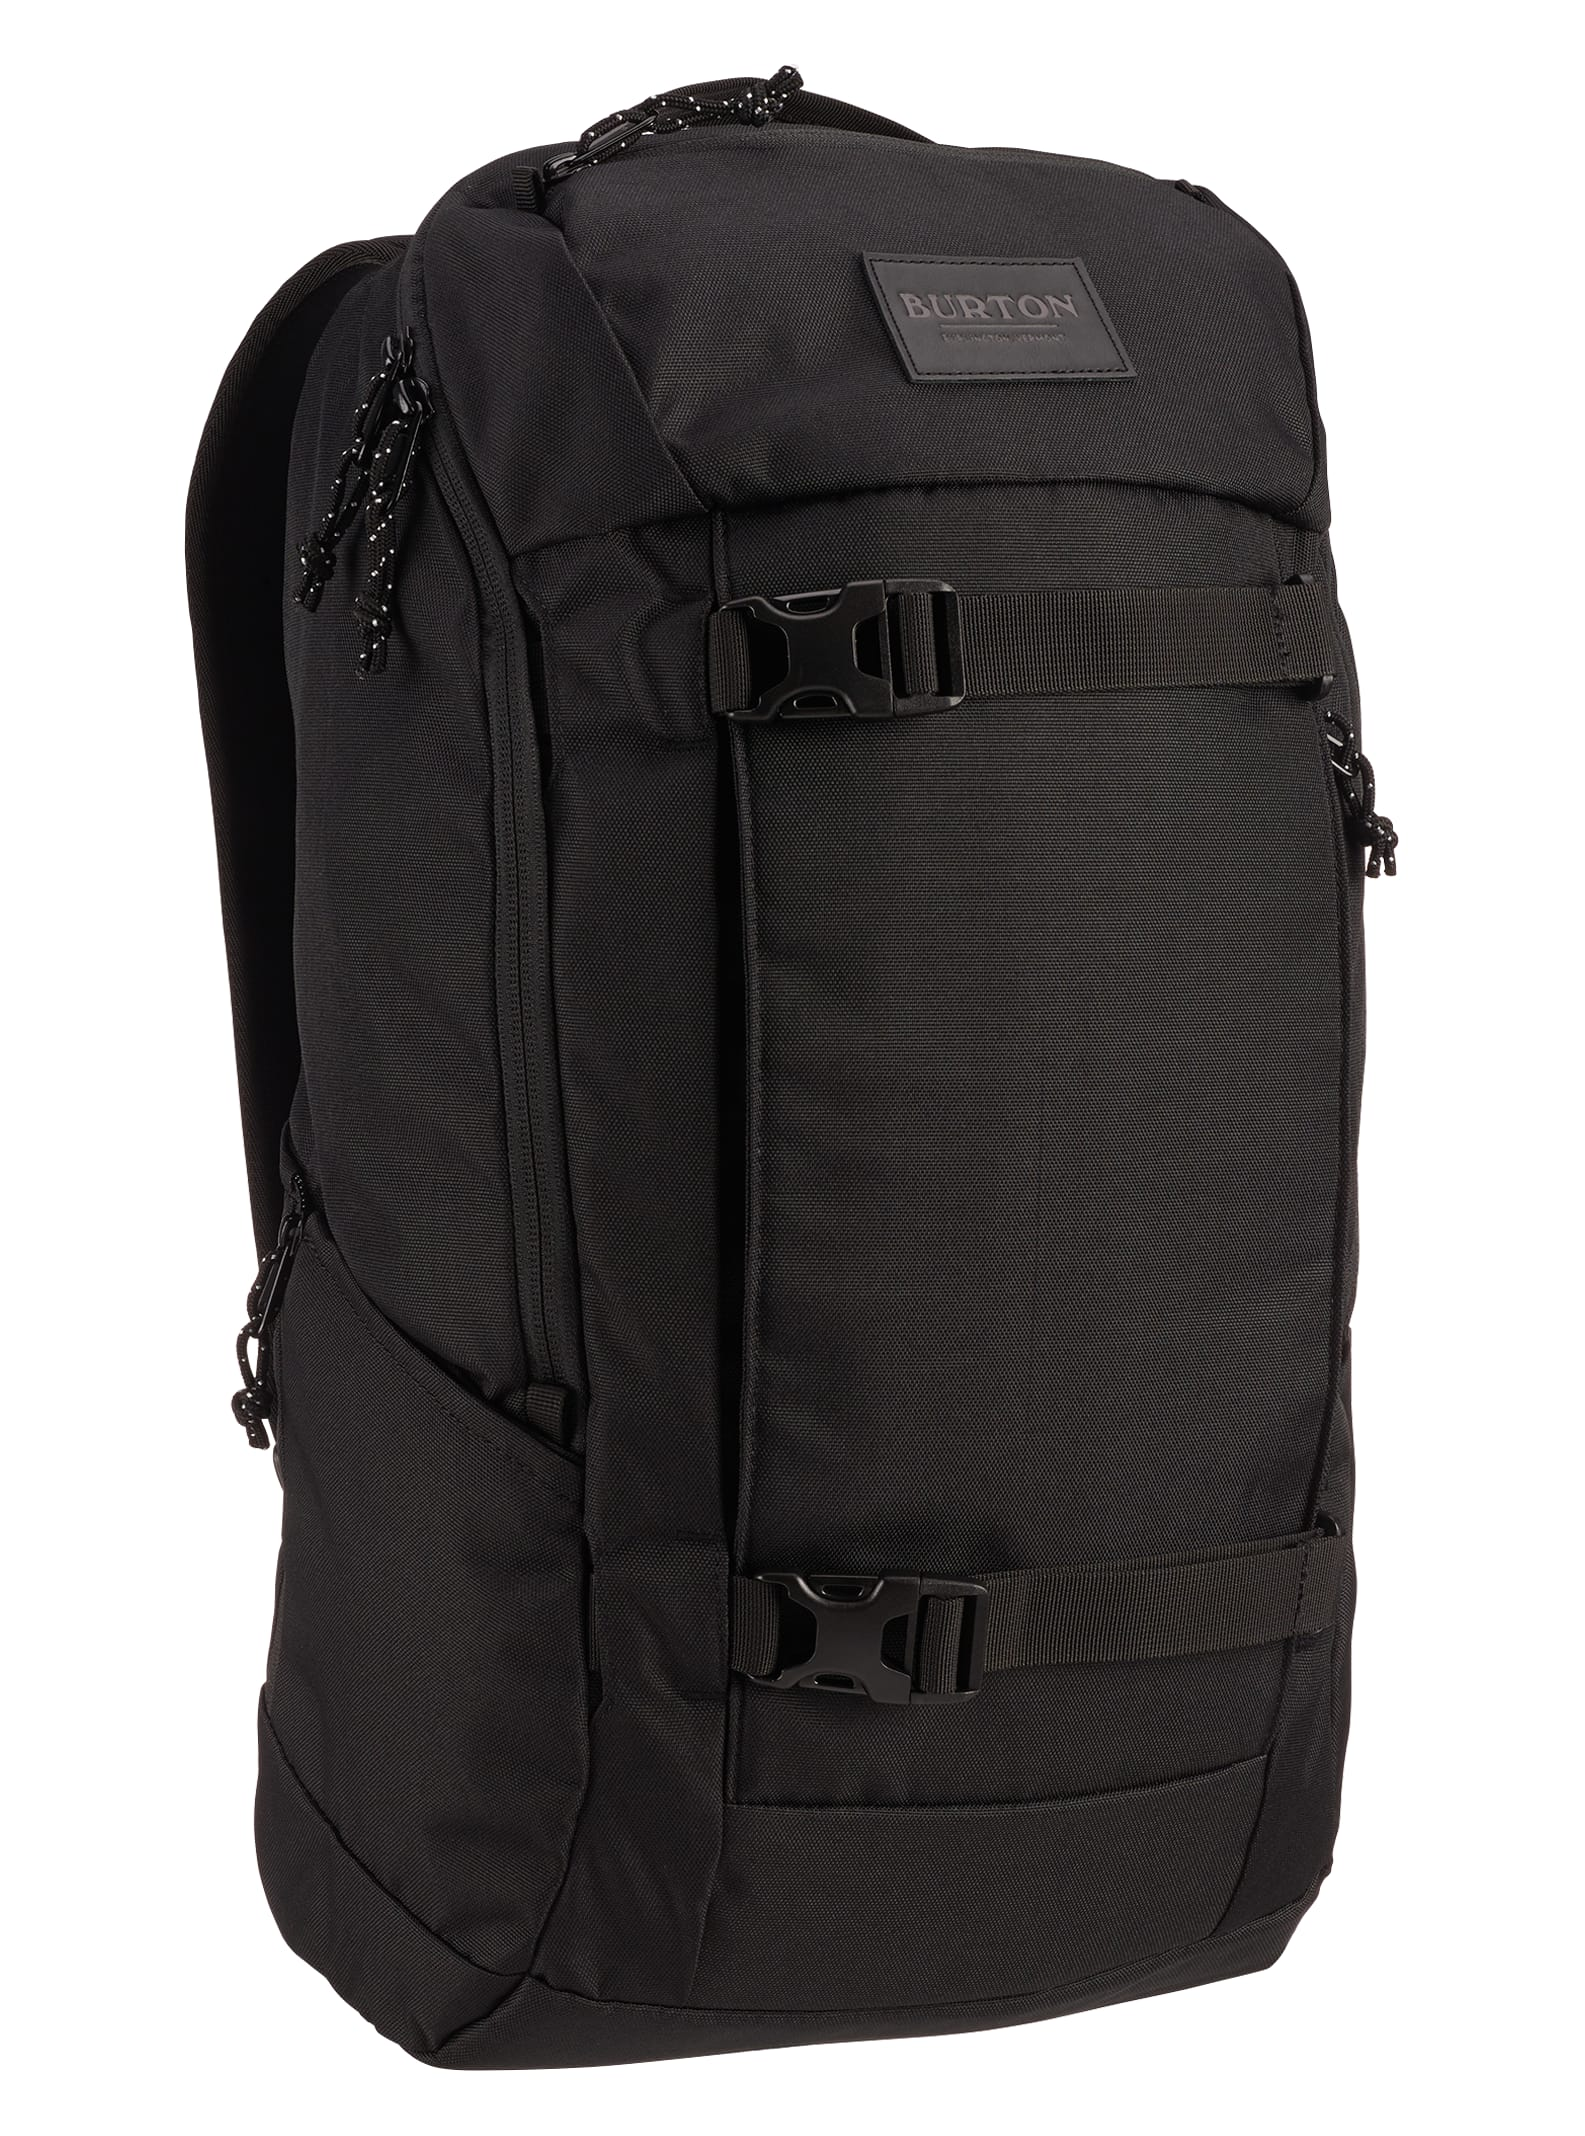 51788337d Backpacks | Burton Snowboards